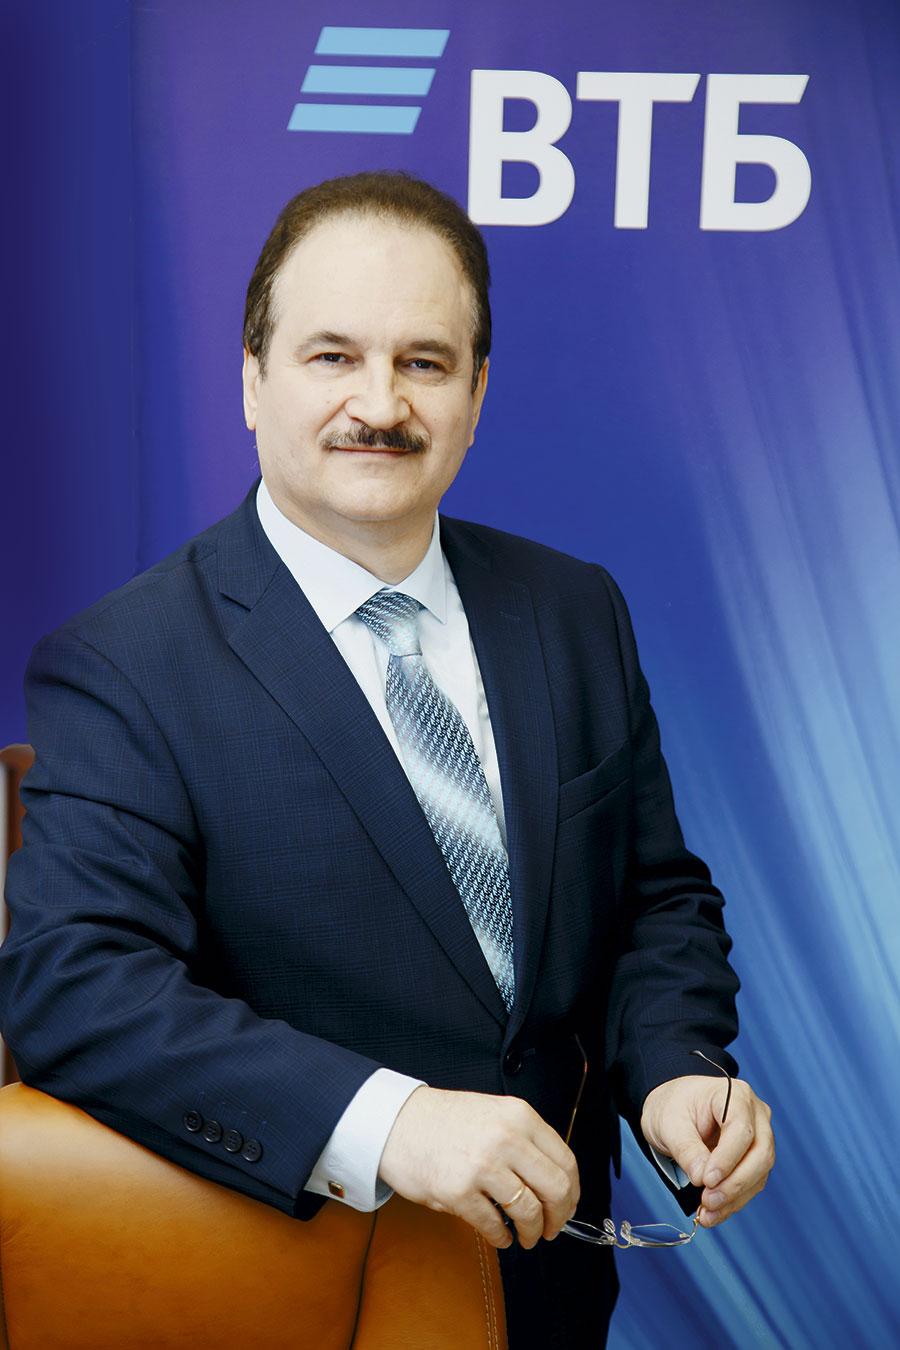 ВТБ: курс на цифровизацию